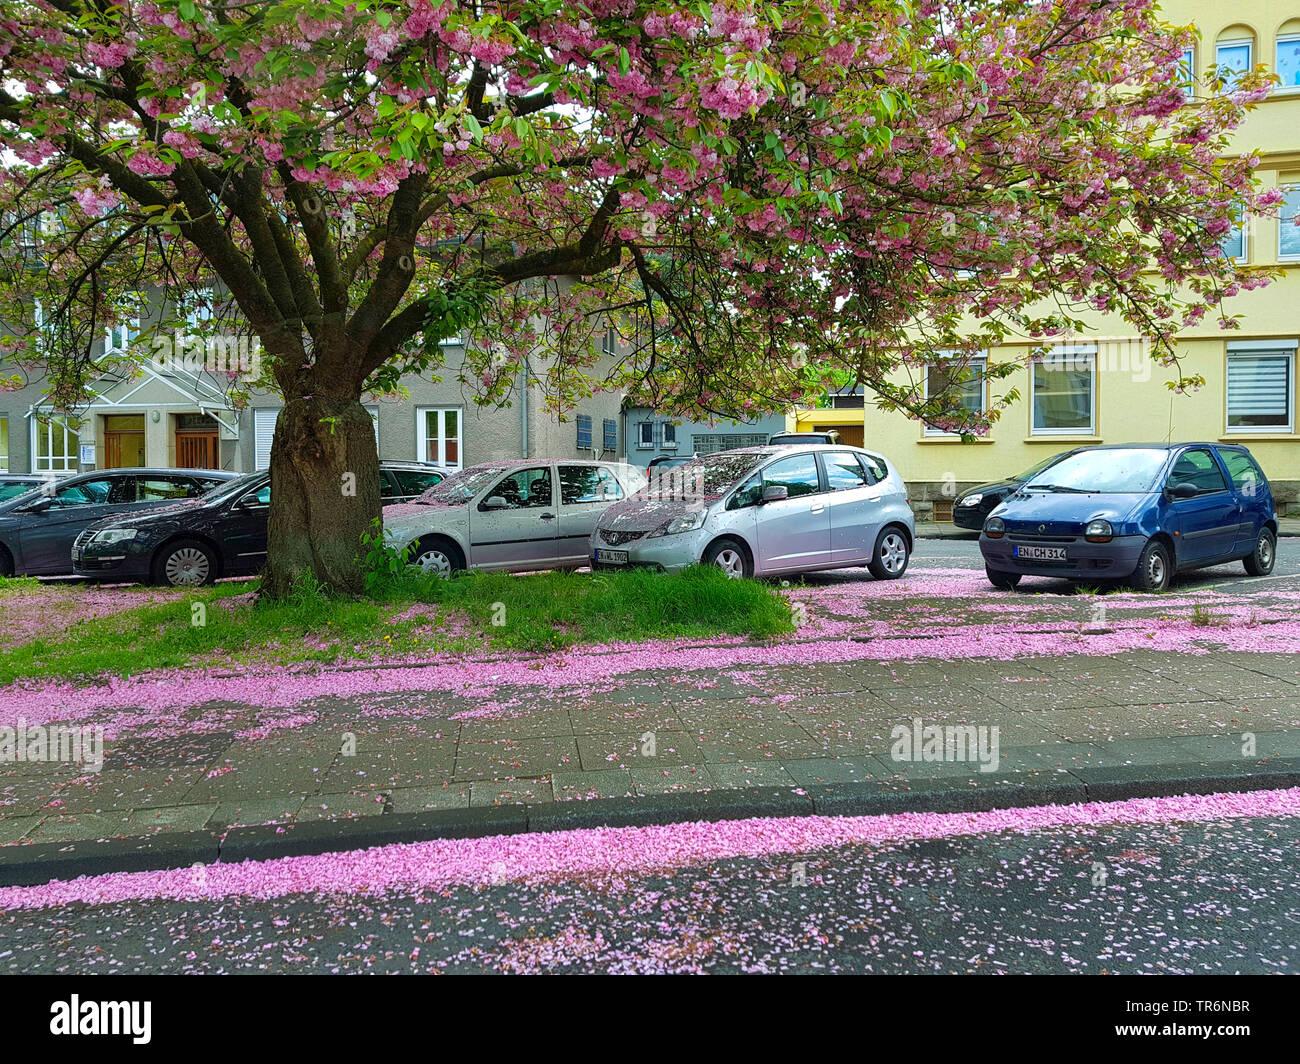 oriental cherry (Prunus serrulata), fallen pink petals covering the street and the cars, Germany, North Rhine-Westphalia - Stock Image